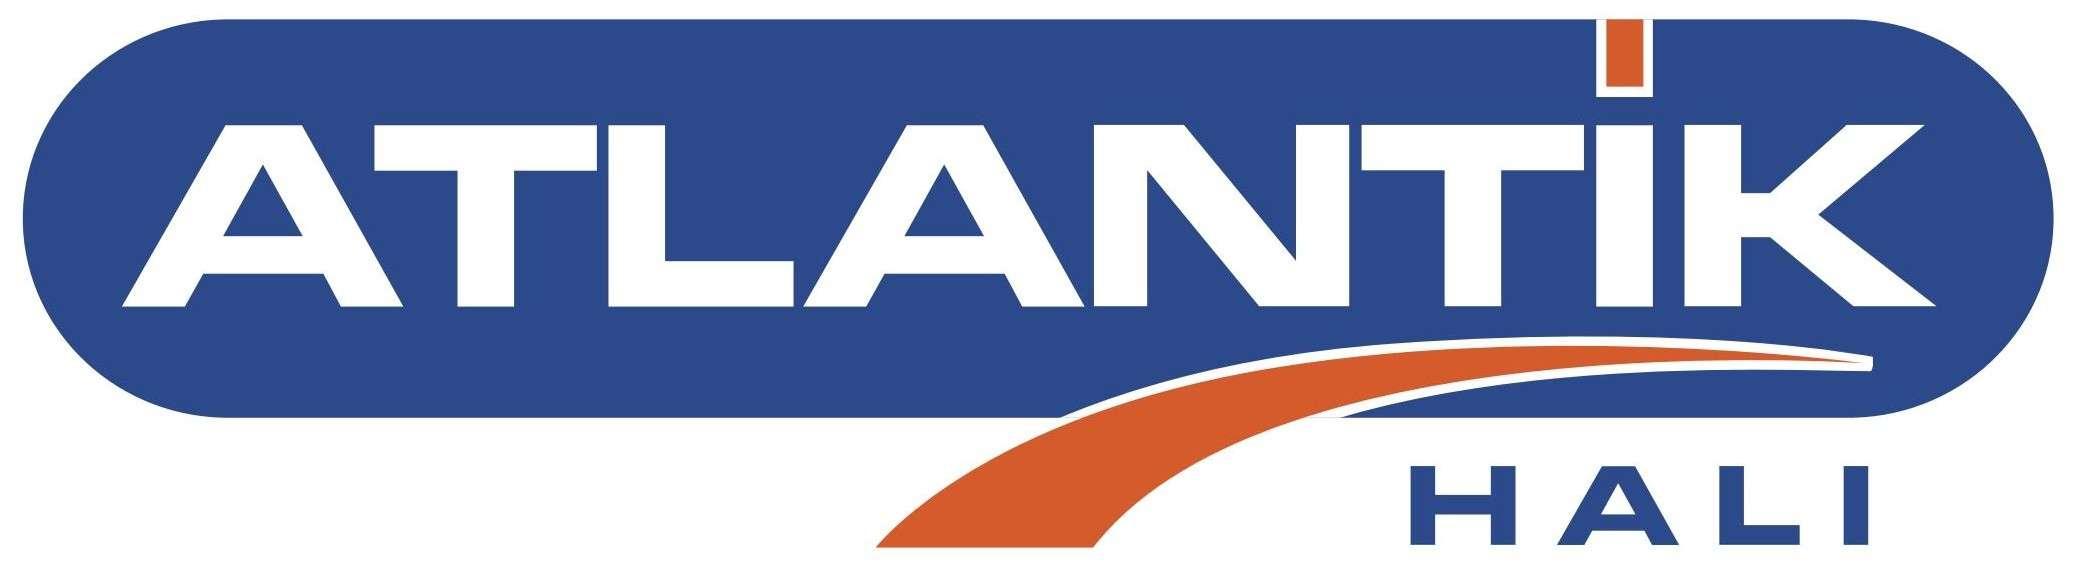 Atlantik Halı Logo [EPS] png